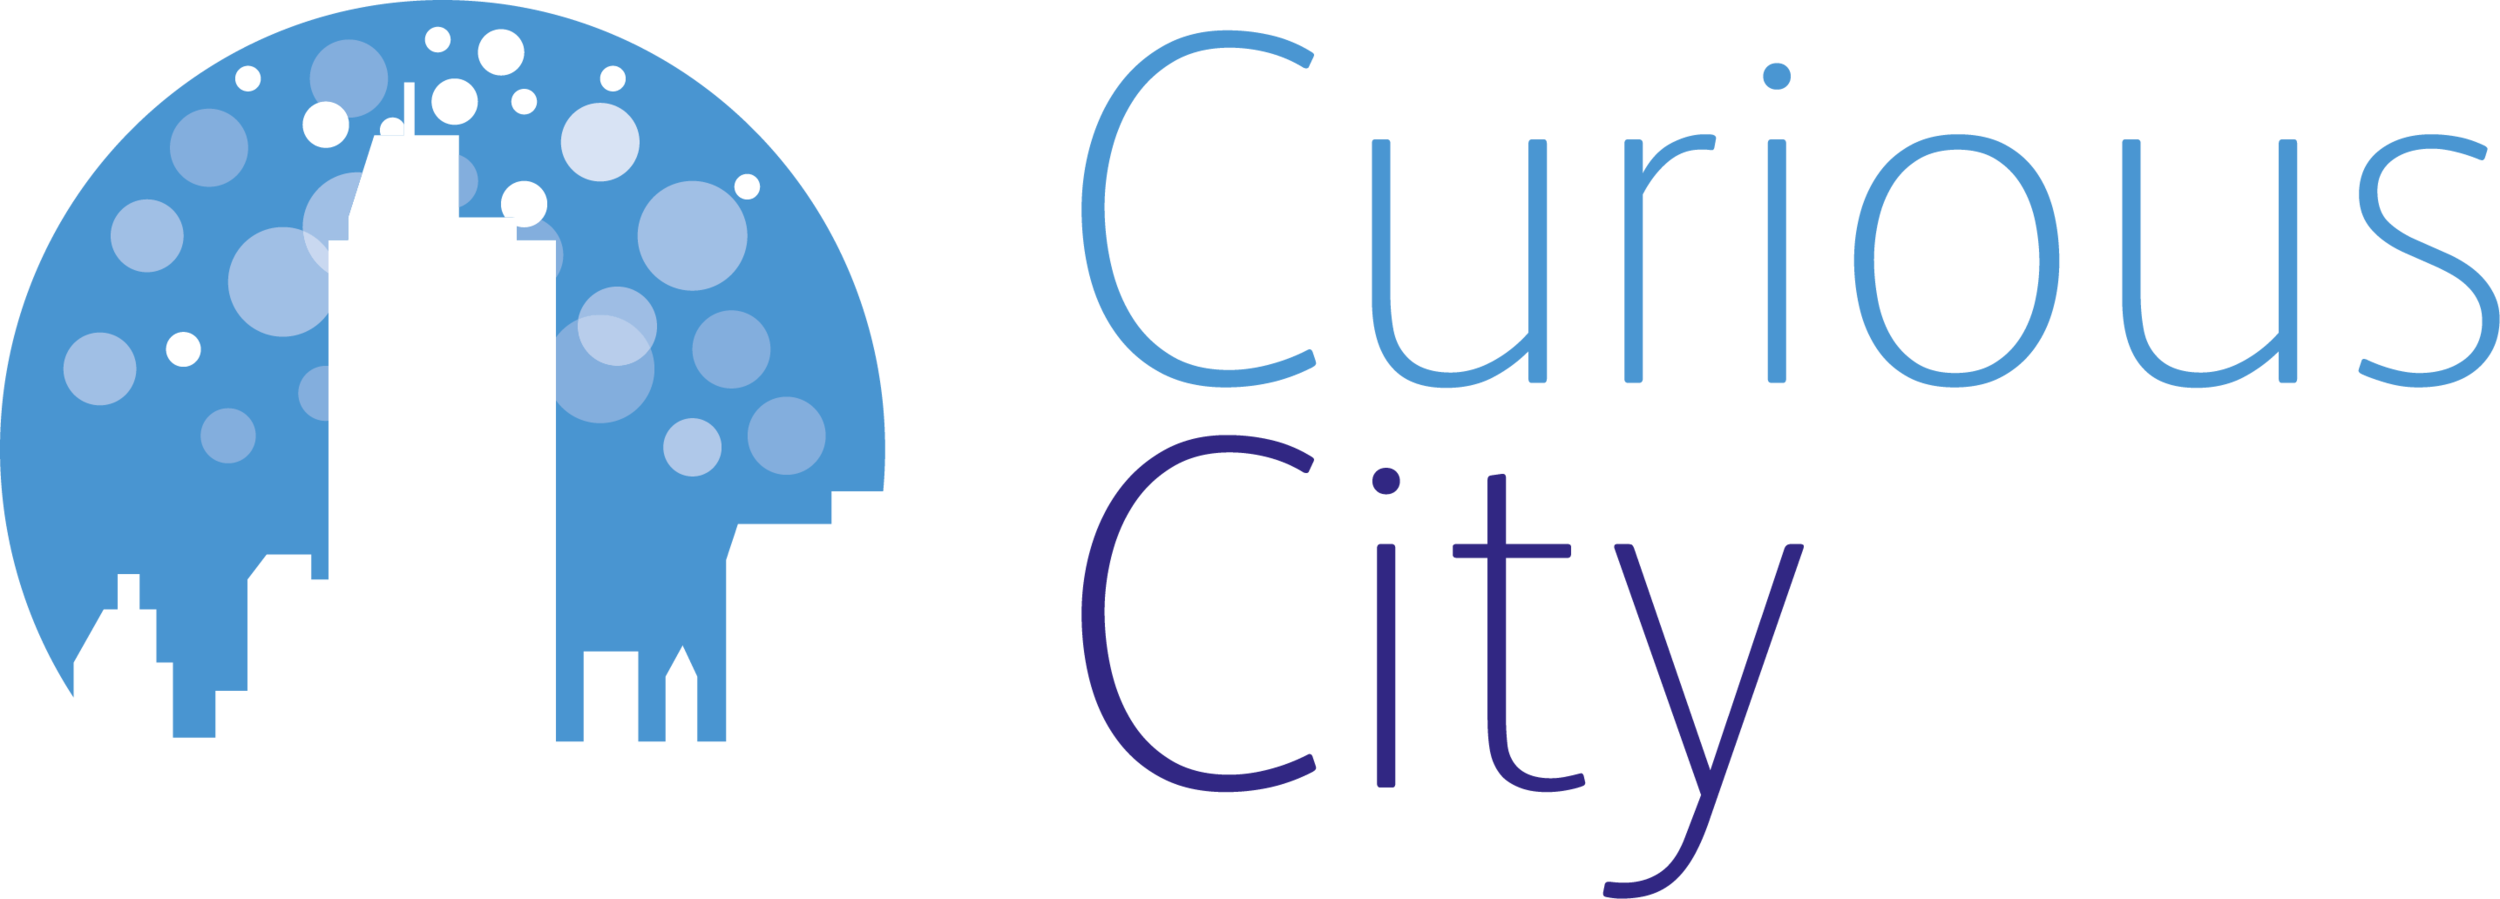 Curious City.png